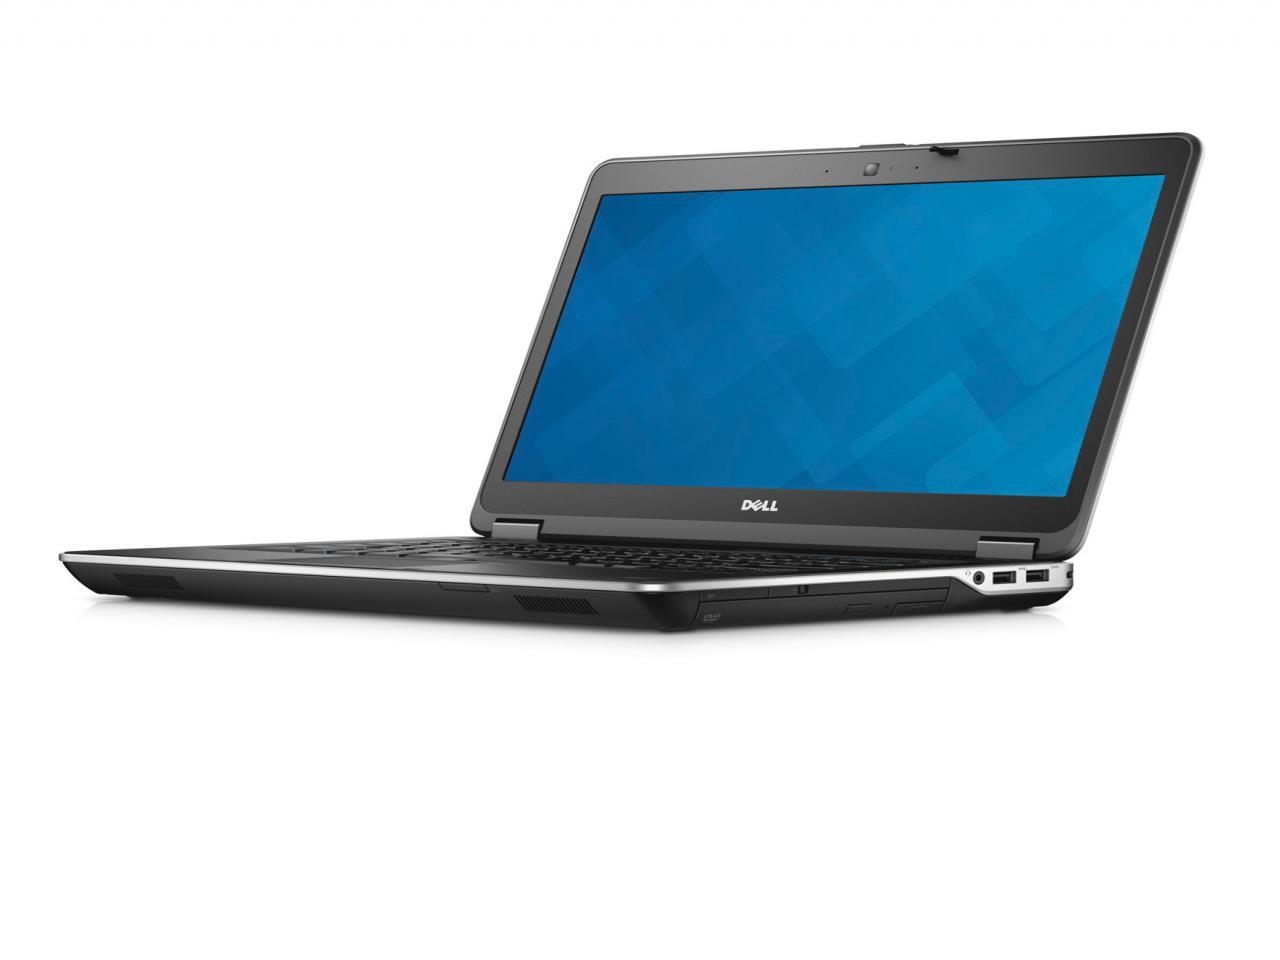 Dell Latitude E6440  - shop.bb-net.de